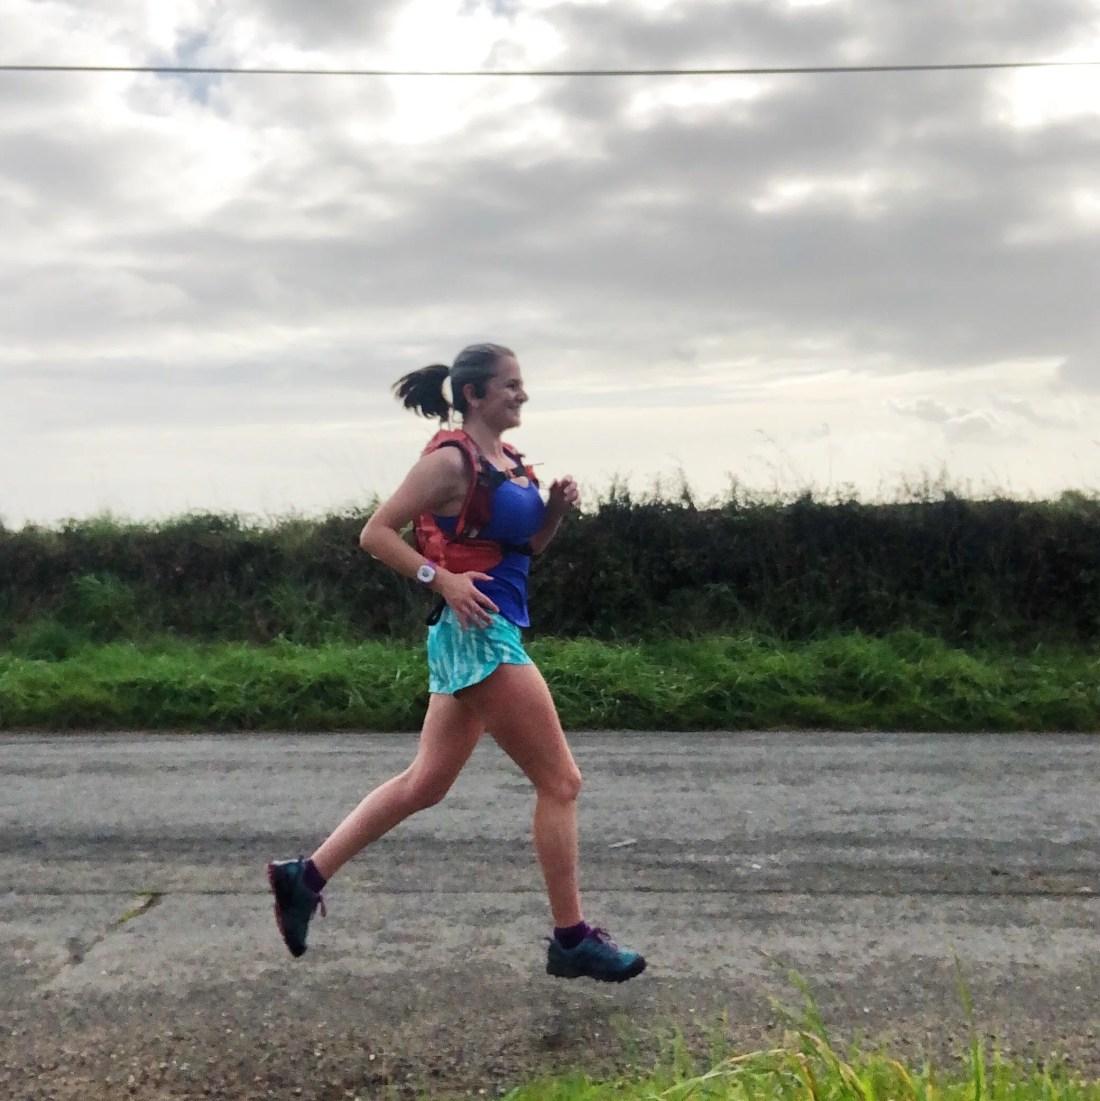 Woman start running mid stride road